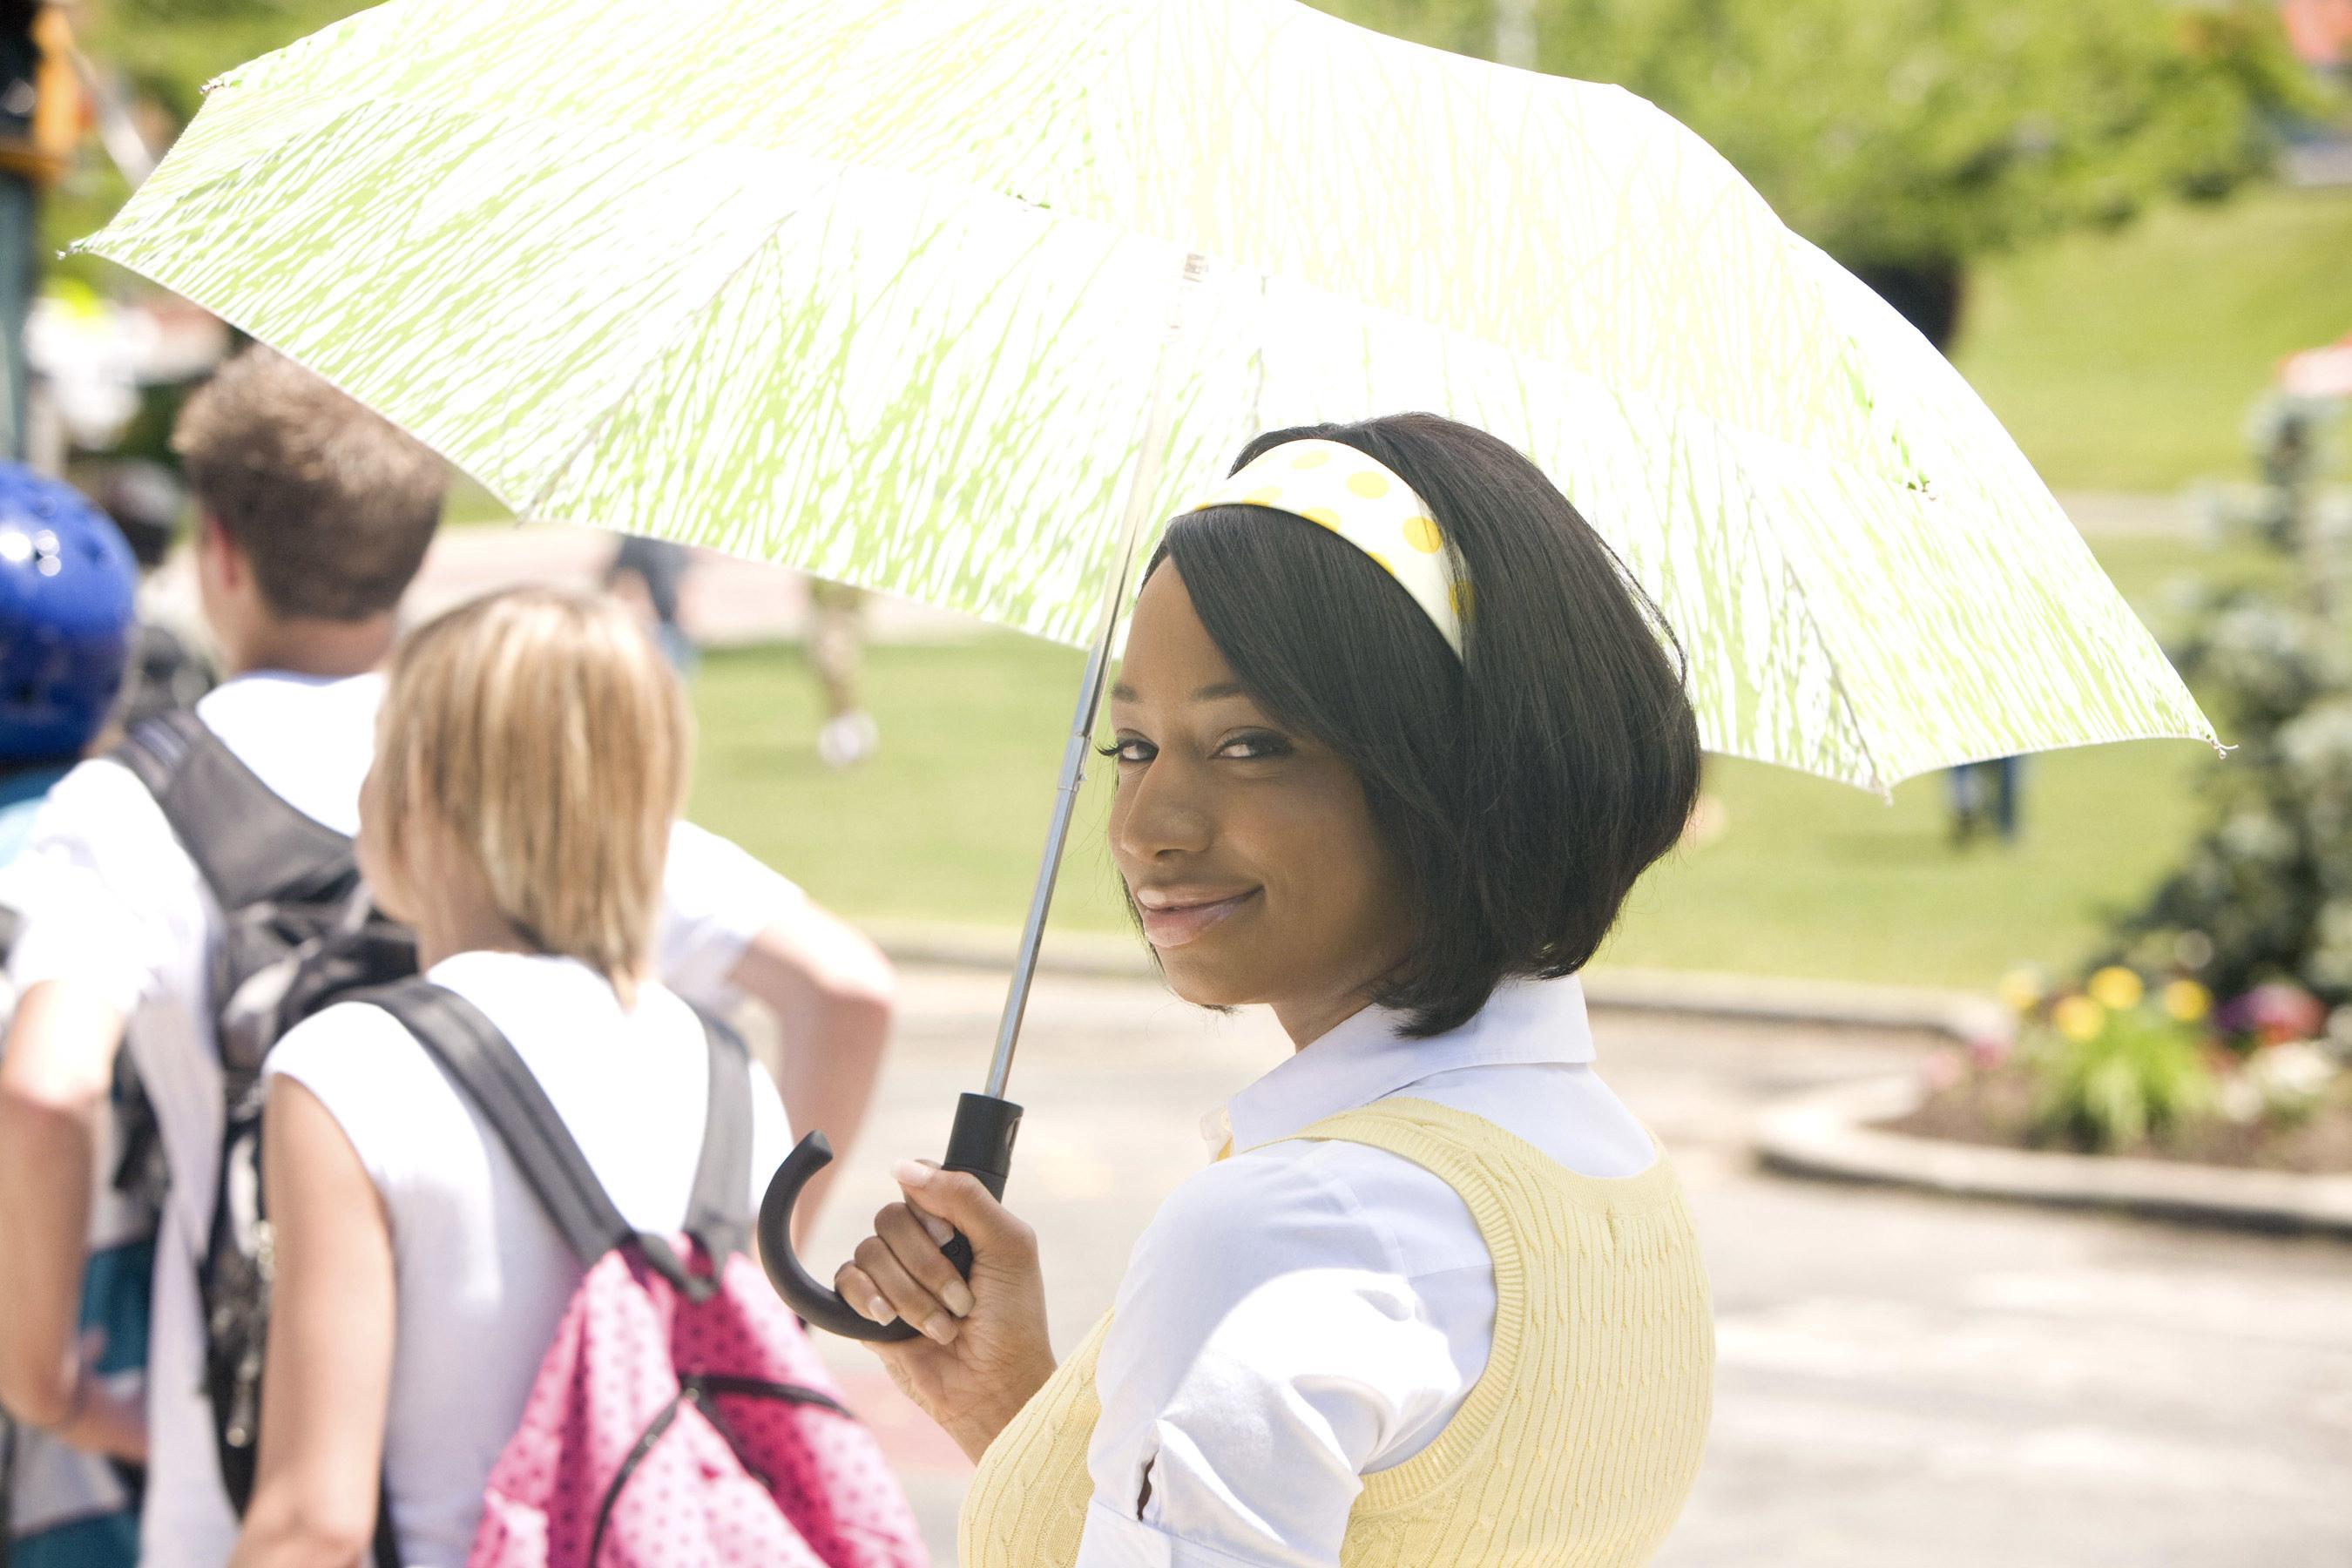 Taylor wearing a light yellow headband and holding a yellow umbrella